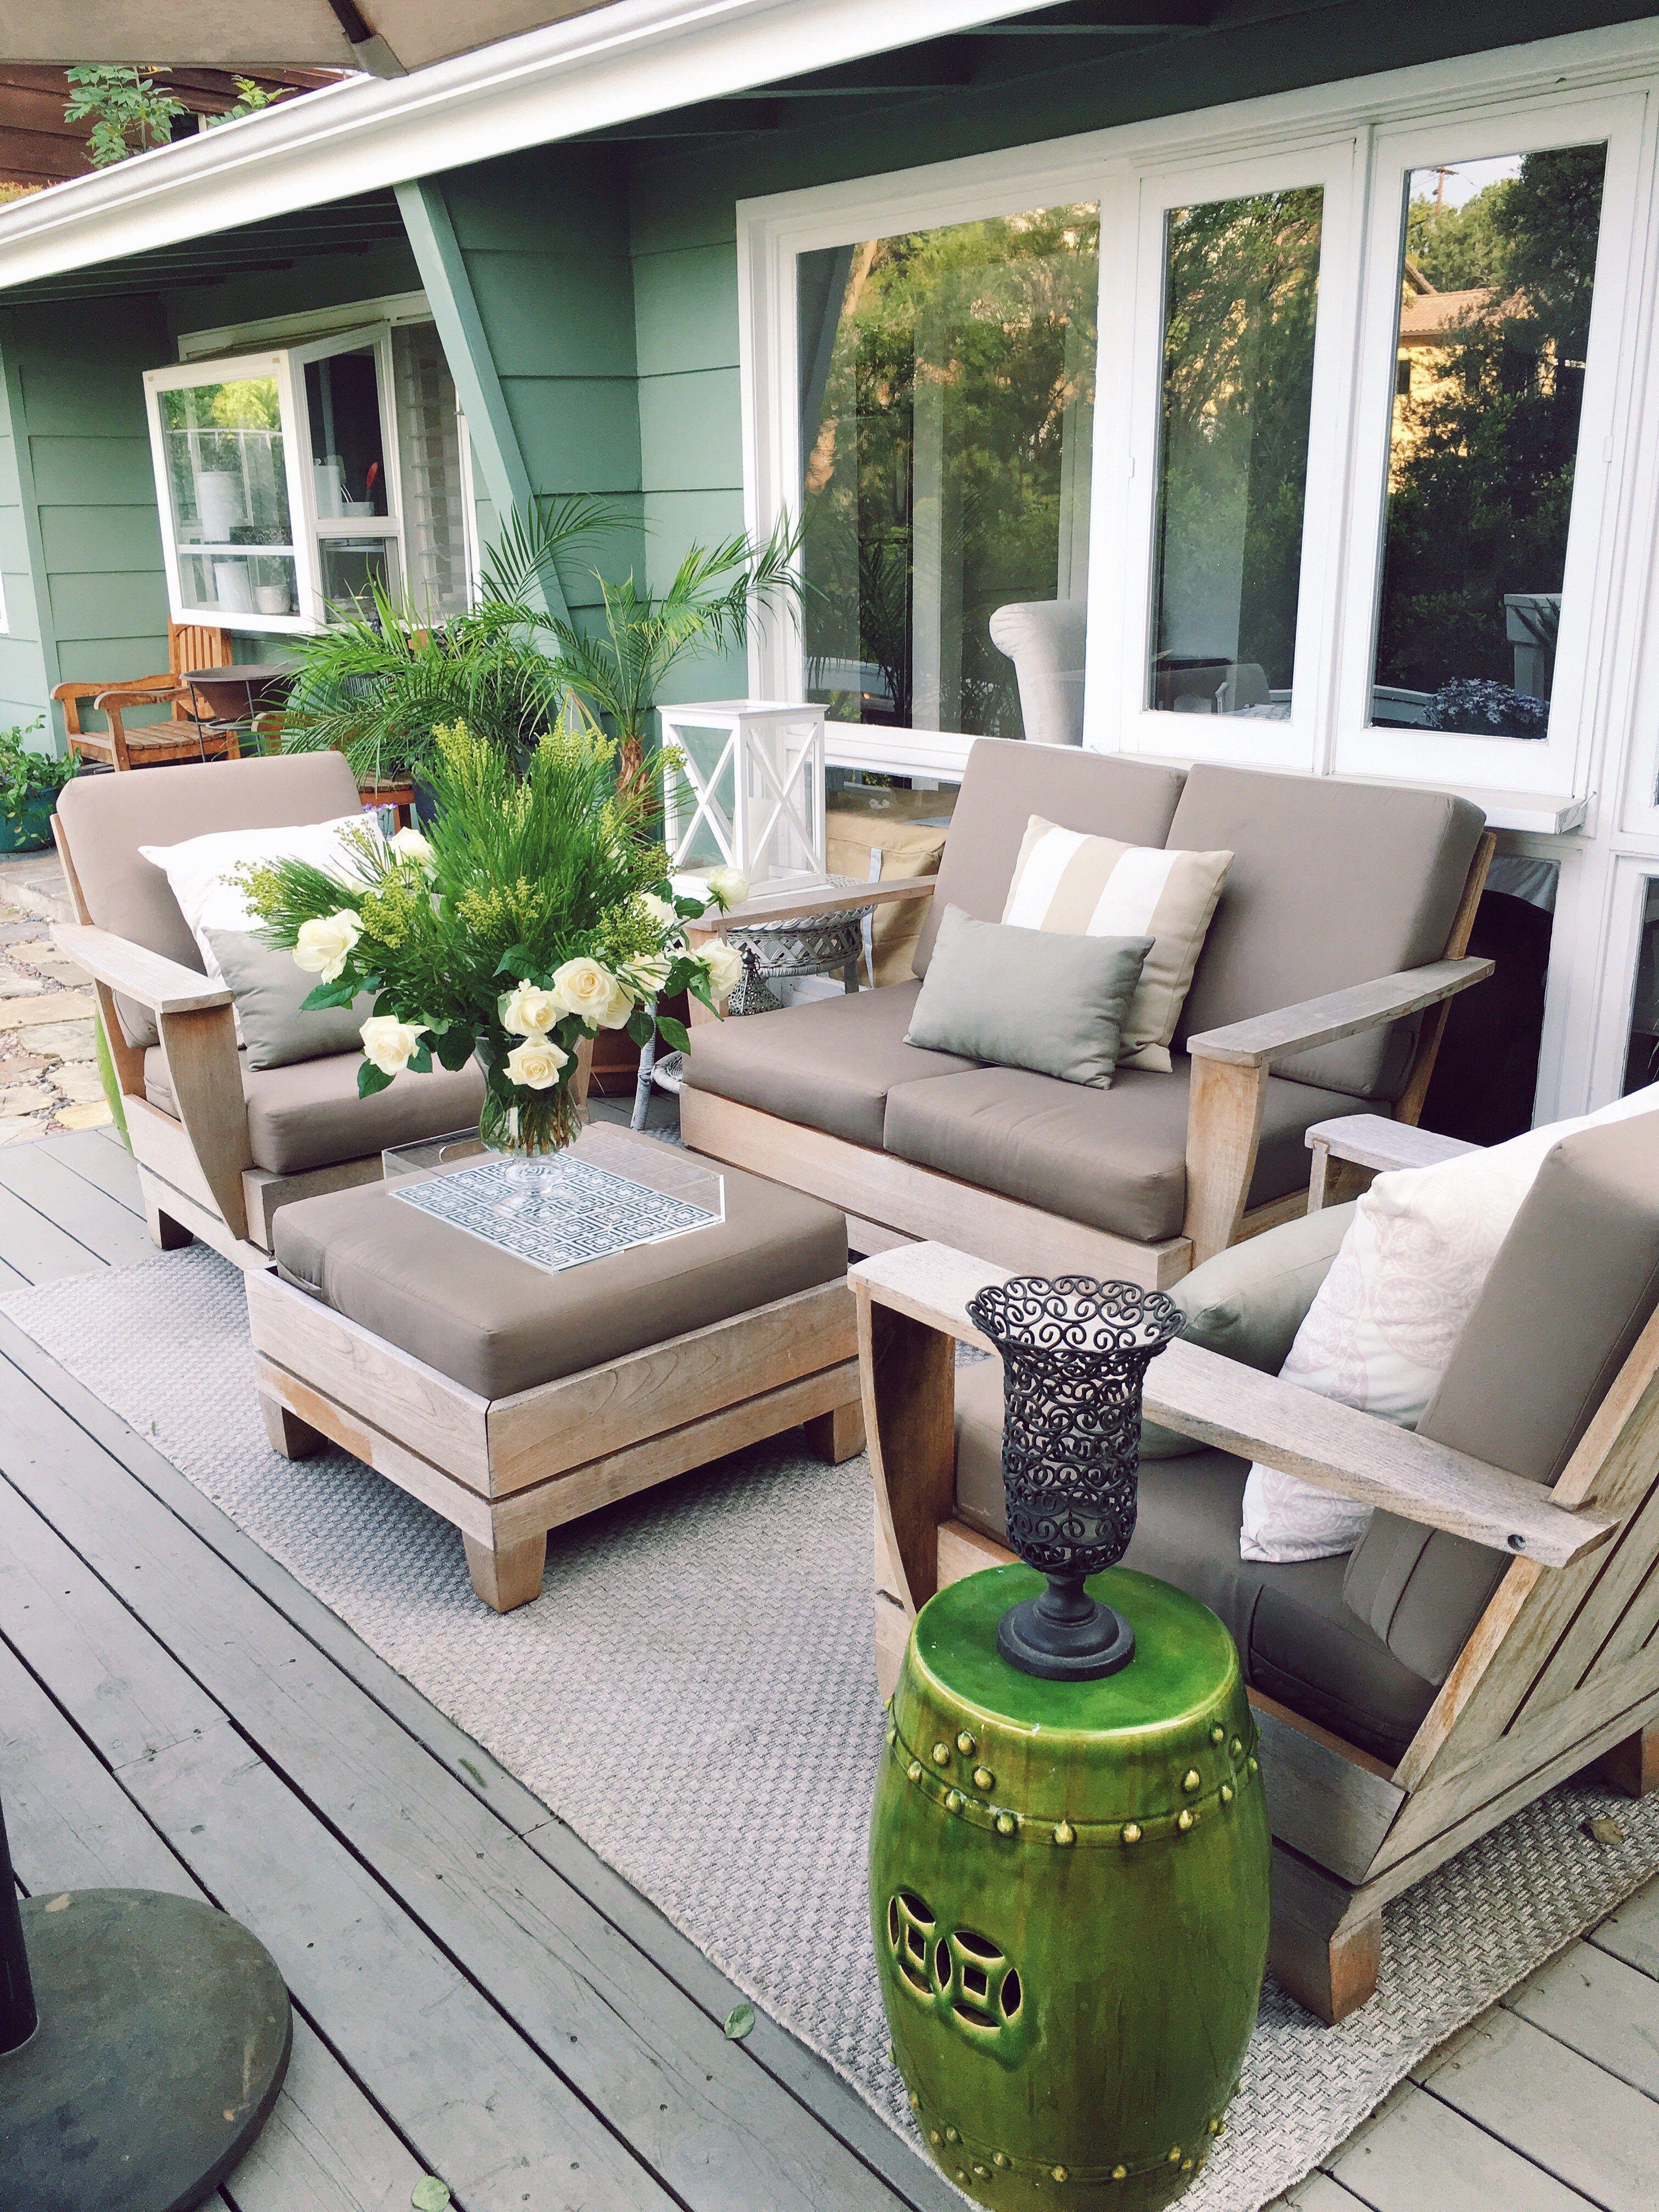 Outdoor Deck Decor My Winter Garden